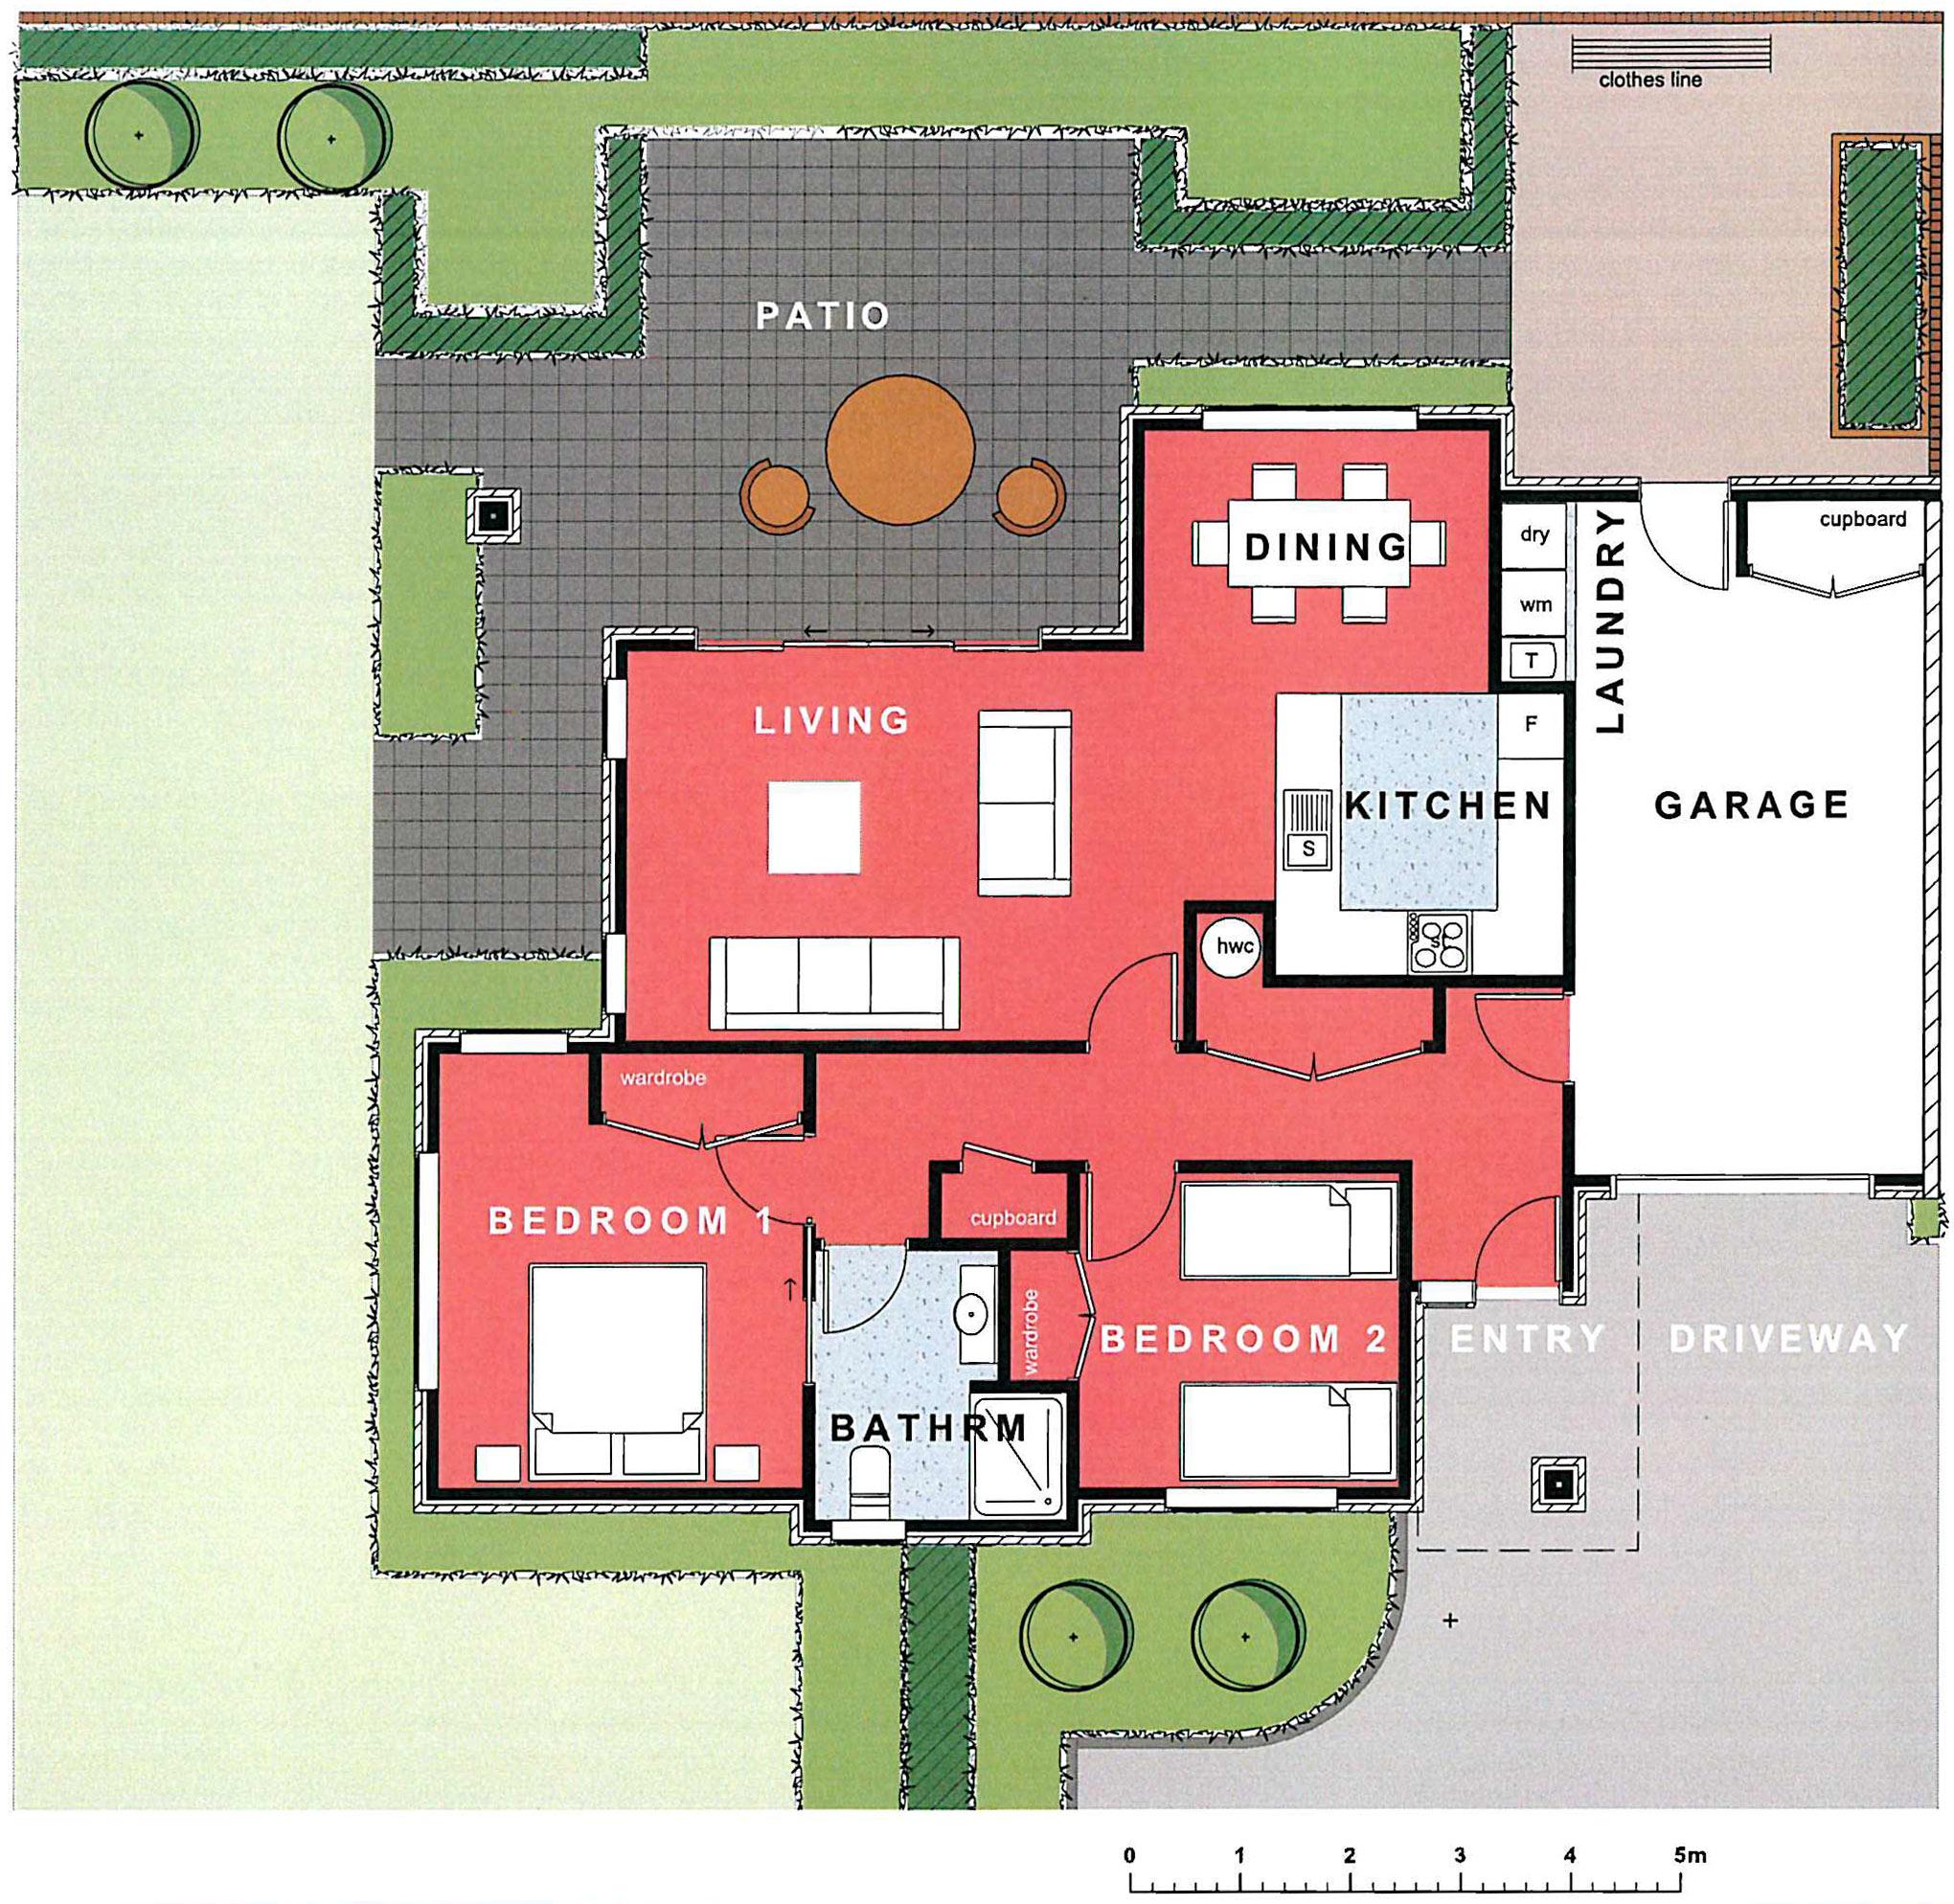 Thorrington Villa #33 Floorplan - Archer Group